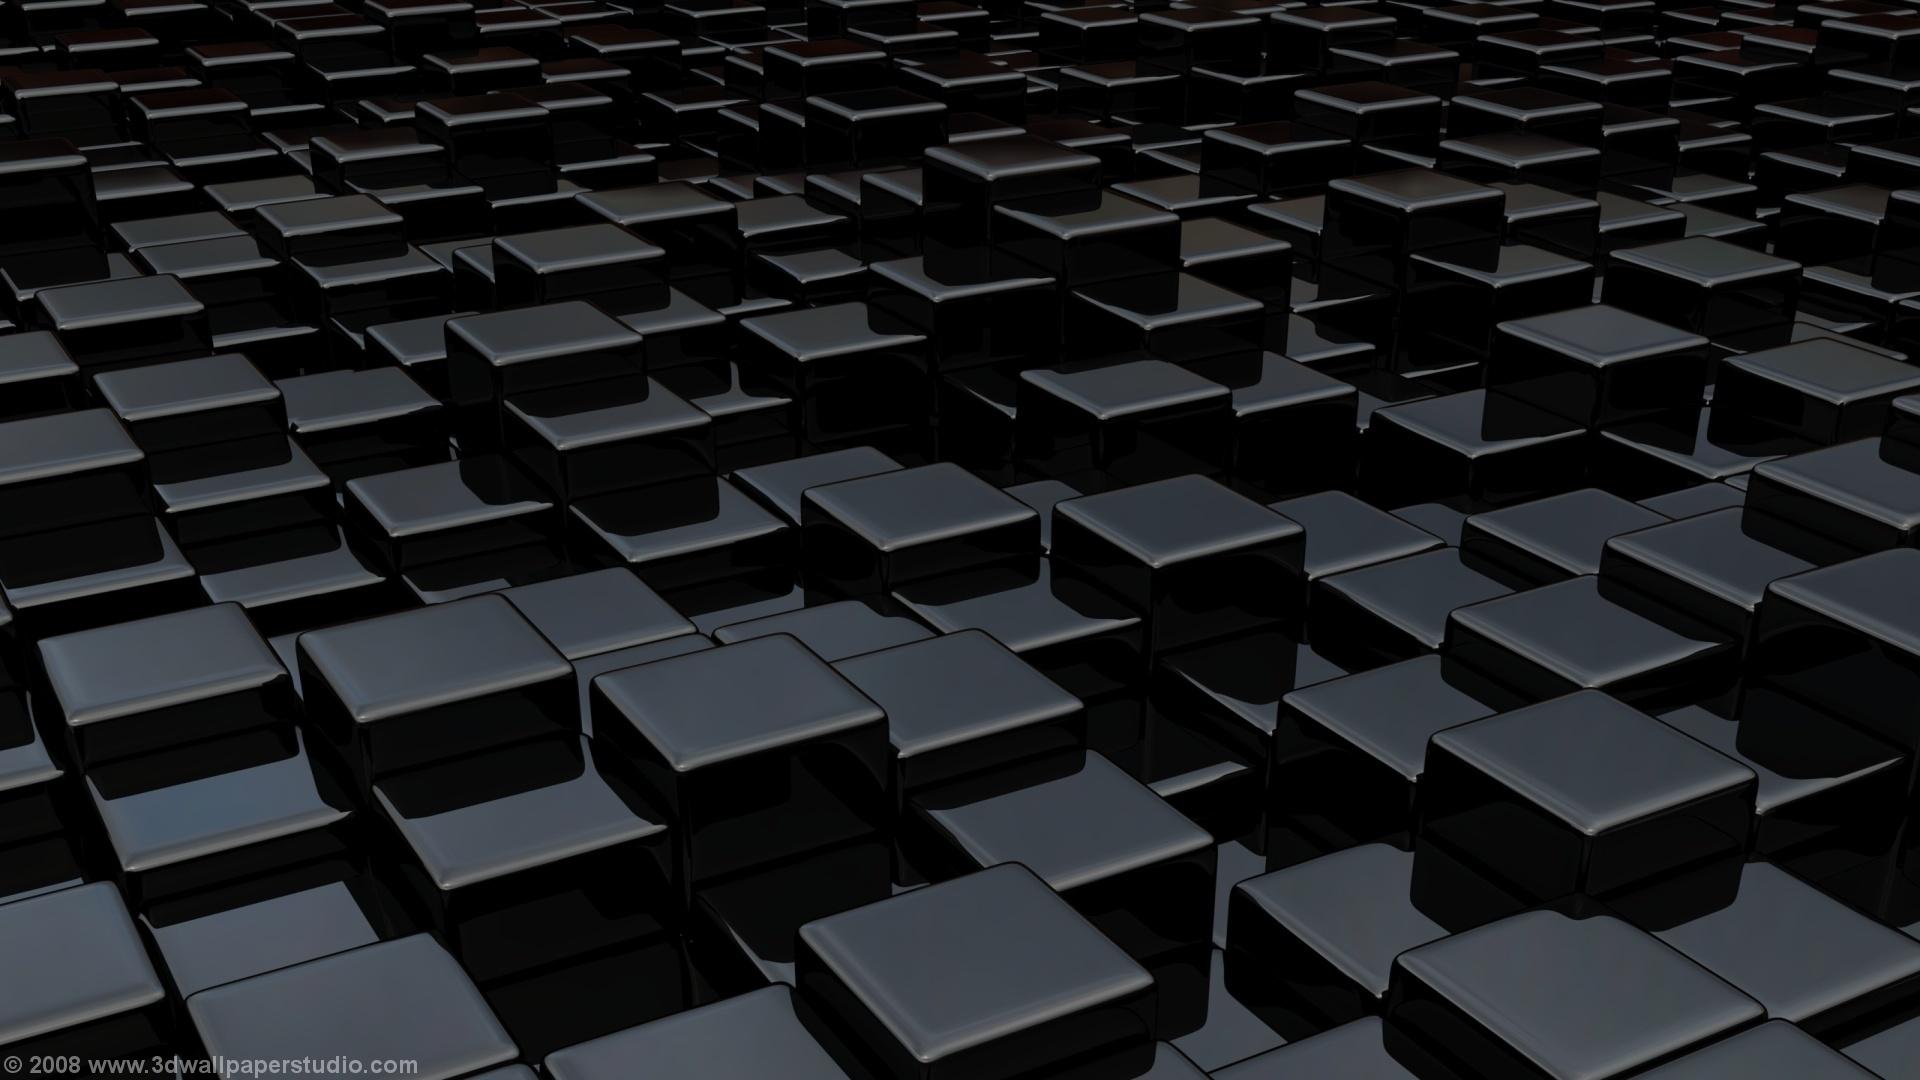 3D Wallpaper Black cube world 1920 x 1080 1920x1080